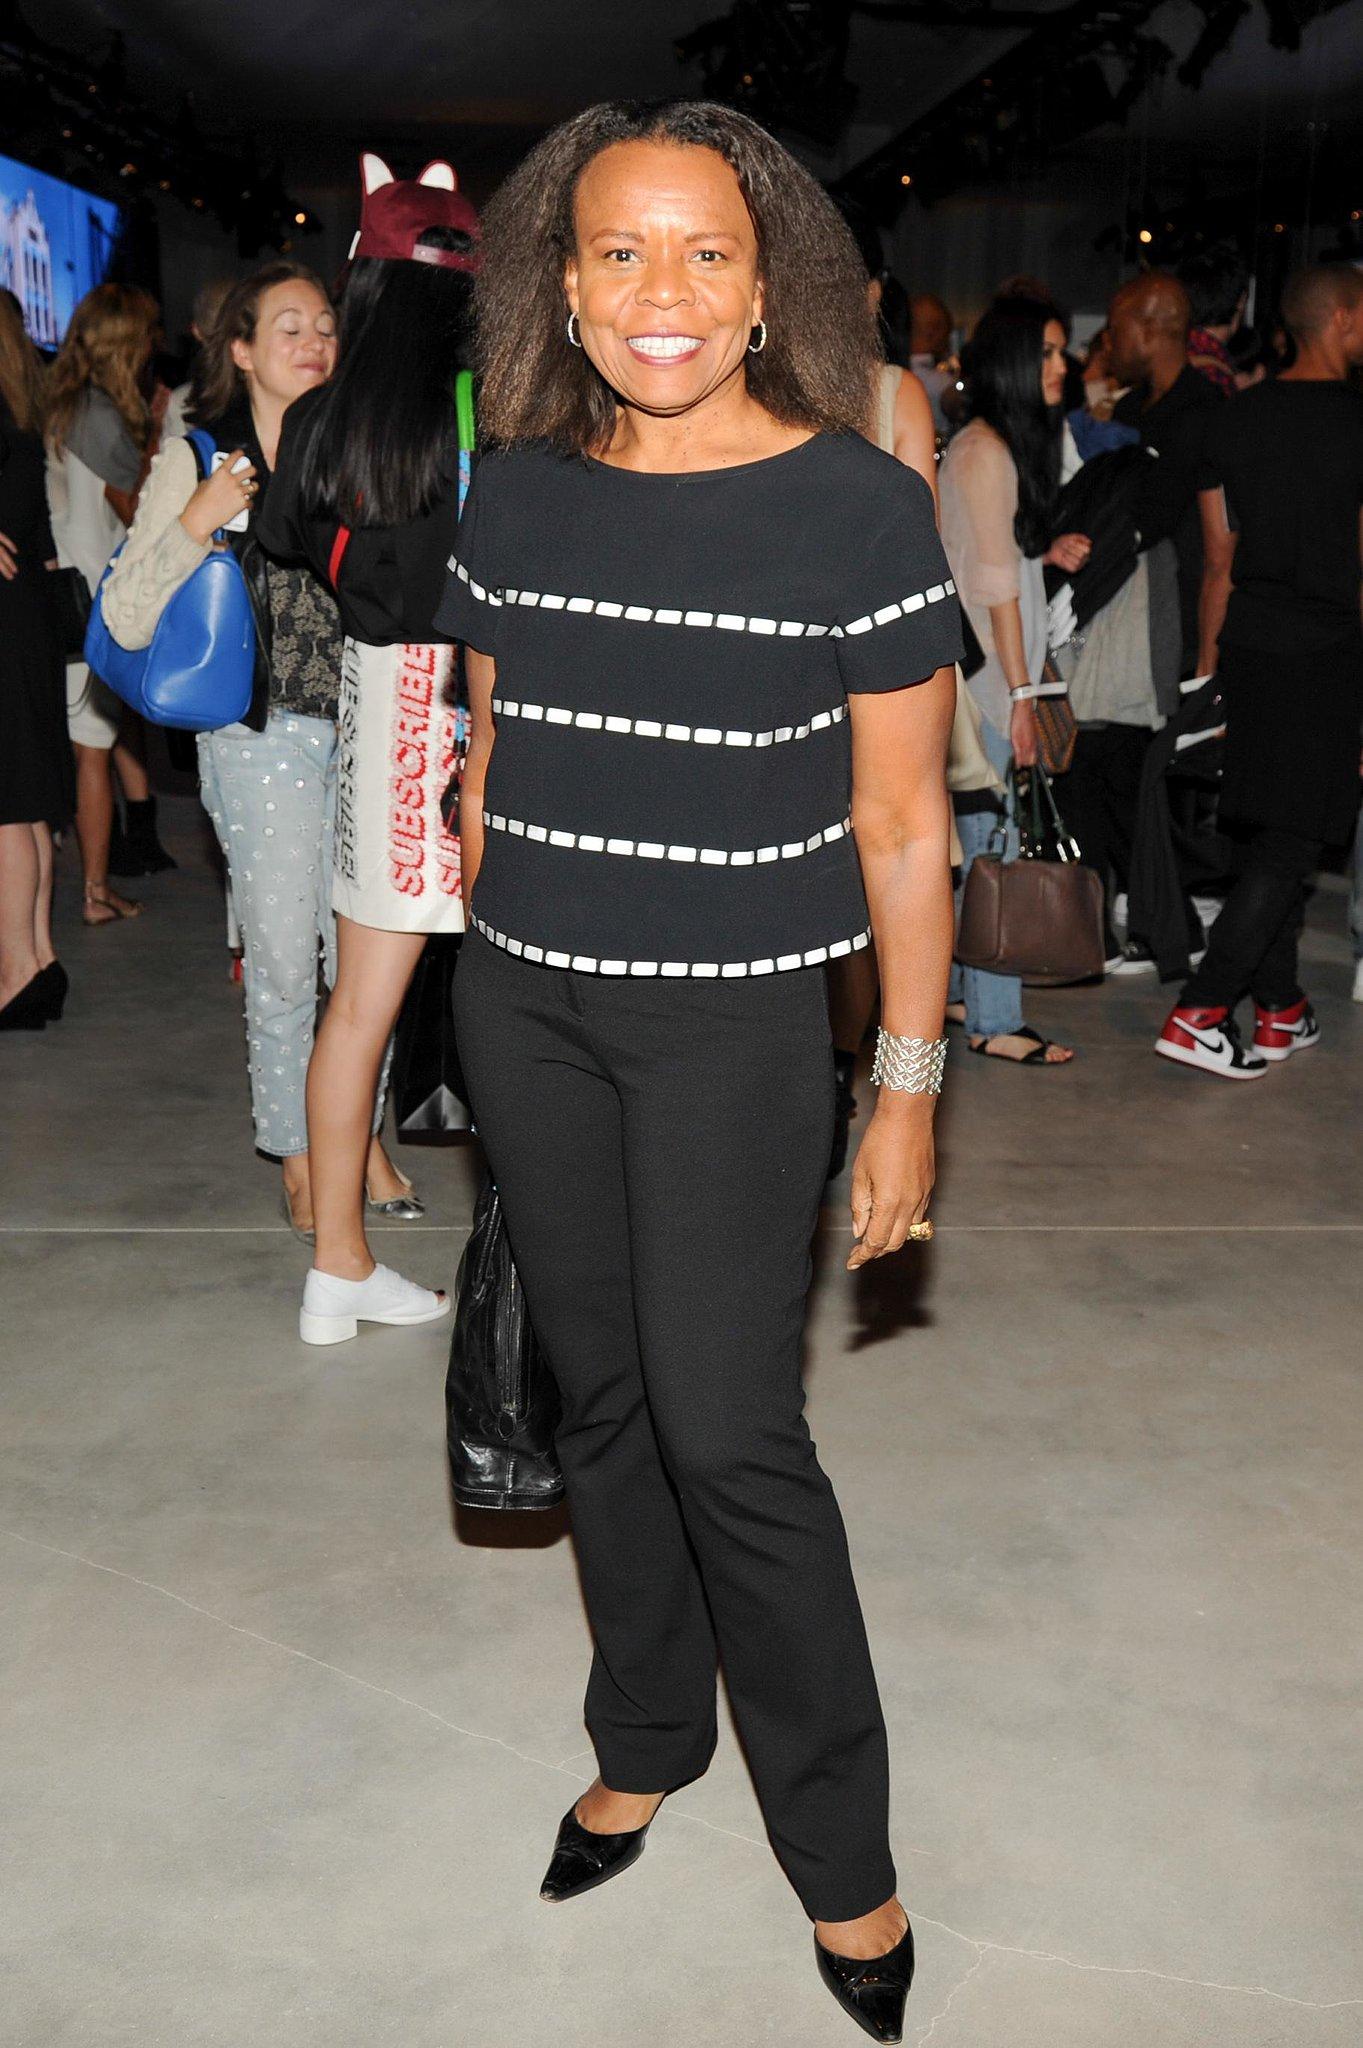 Fashion critic Teri Agins made an appearance at the celebration